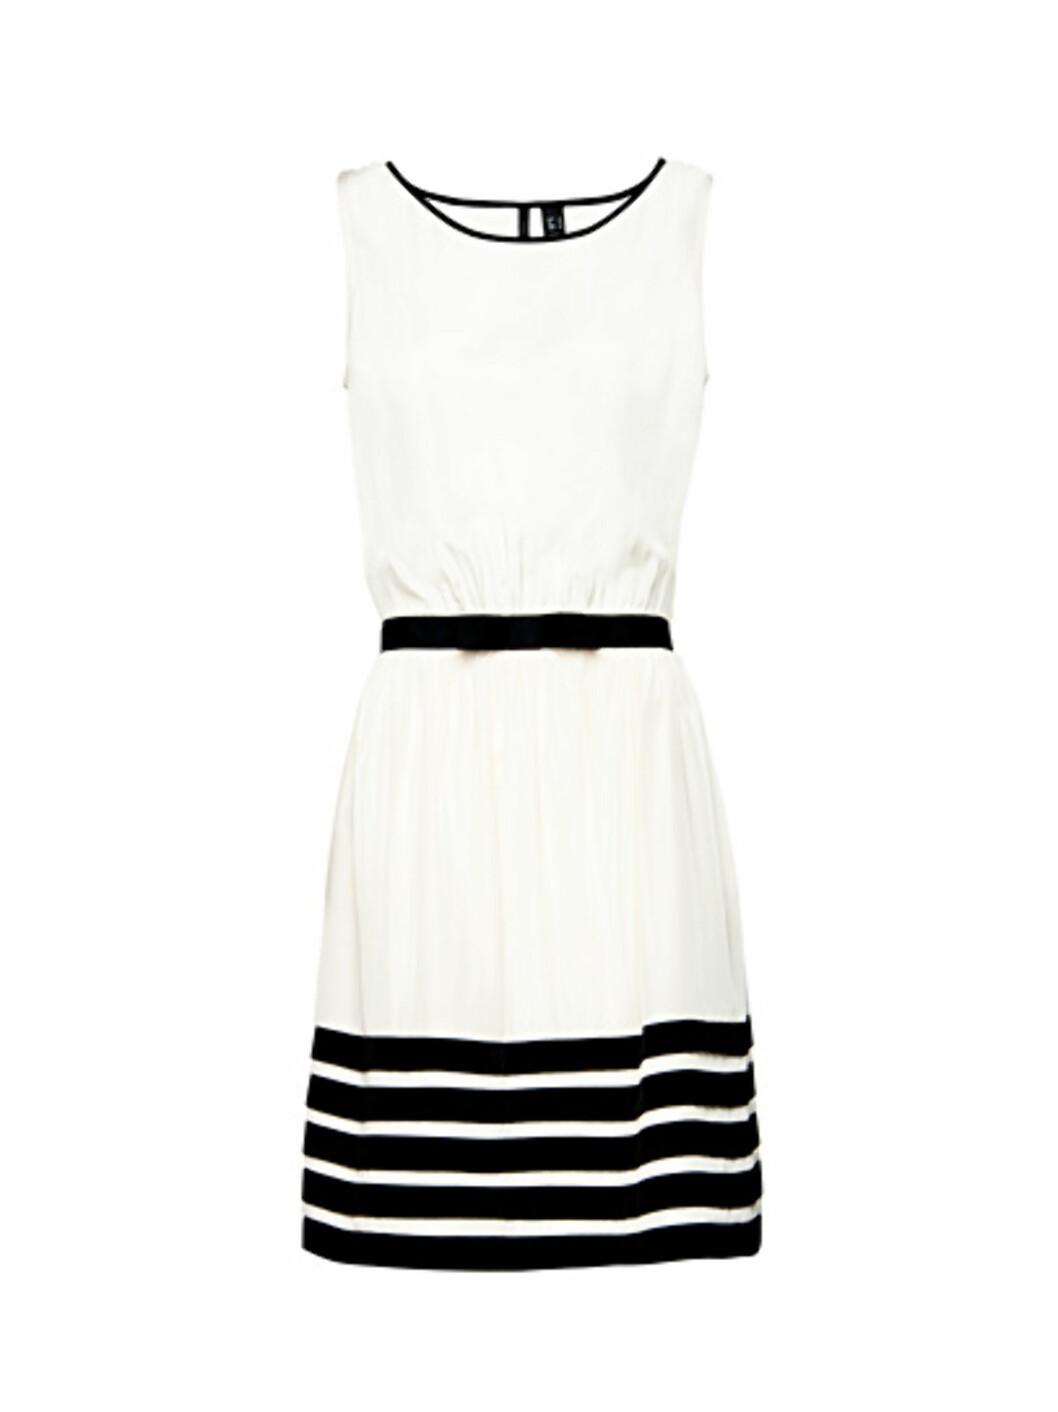 Maritim kjole (kr 399/Mango). Foto: Produsent